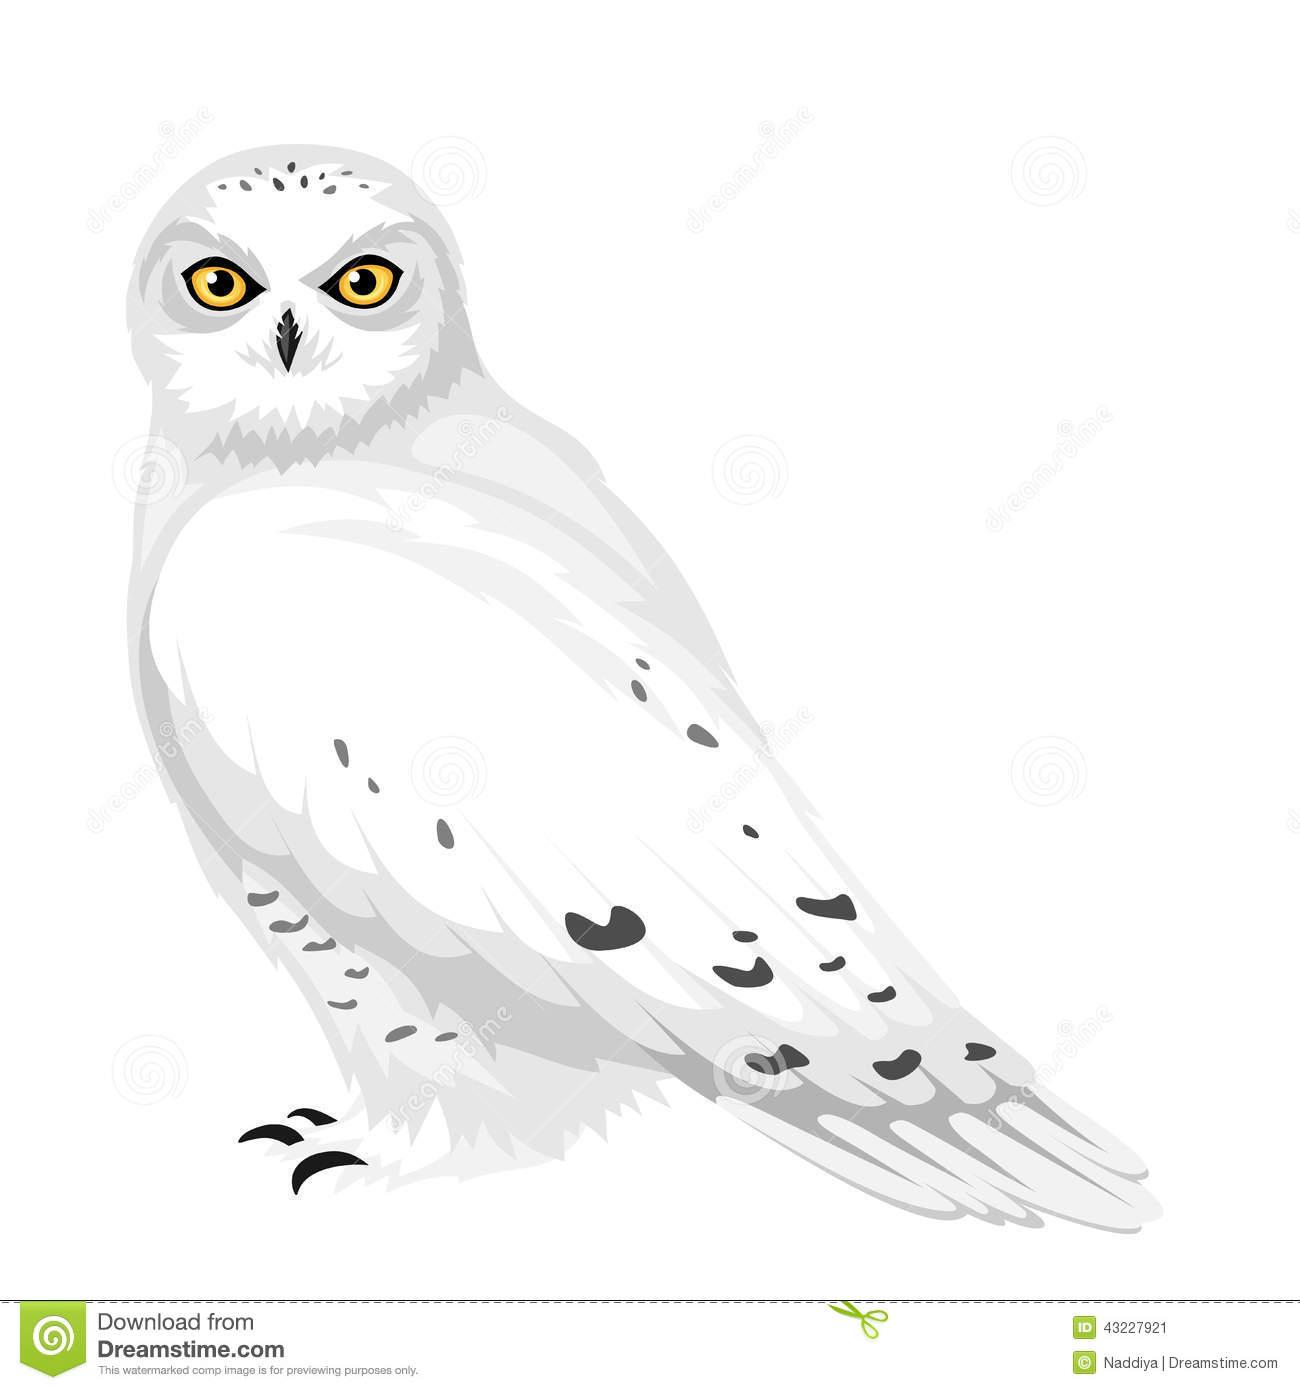 Snowy Owl Vector Illustration Stock Vect-Snowy Owl Vector Illustration Stock Vector Image 43227921-19